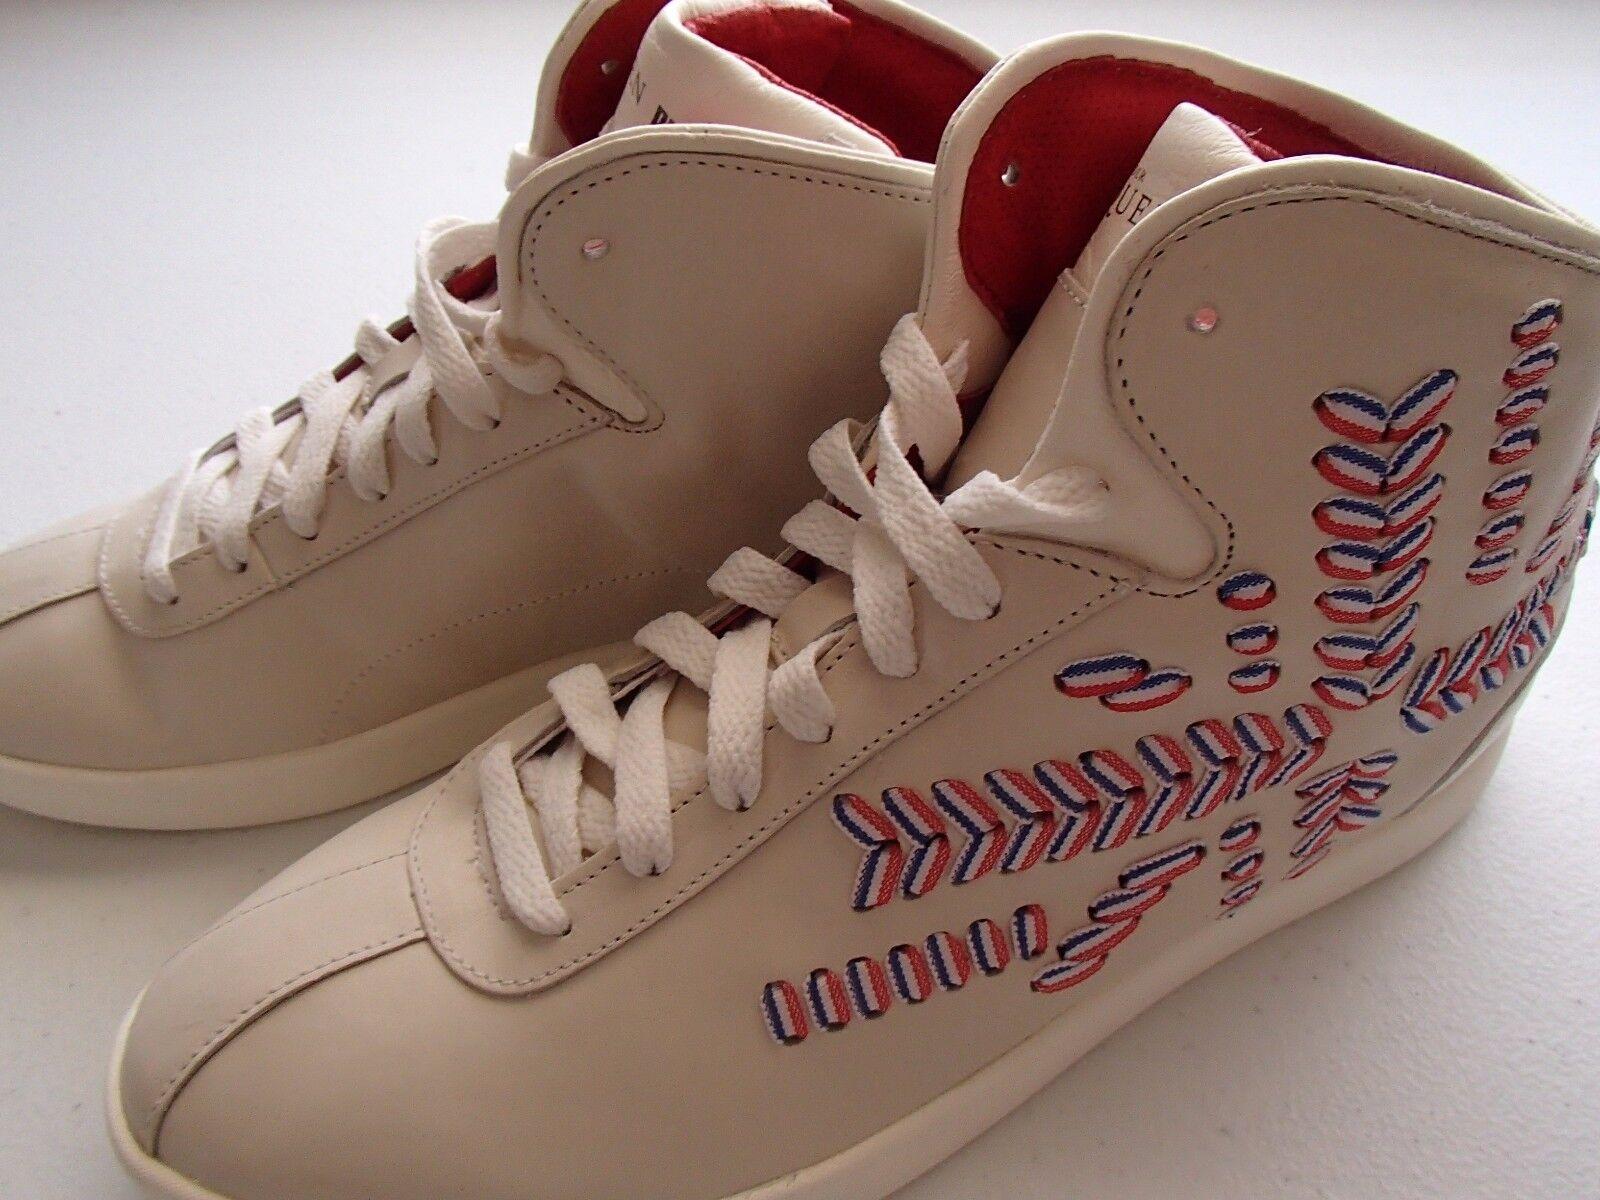 Puma Alexander McQueen AMQ Medius 9.5 MID Leather Women's Shoes, 9.5 Medius M 5aeea4